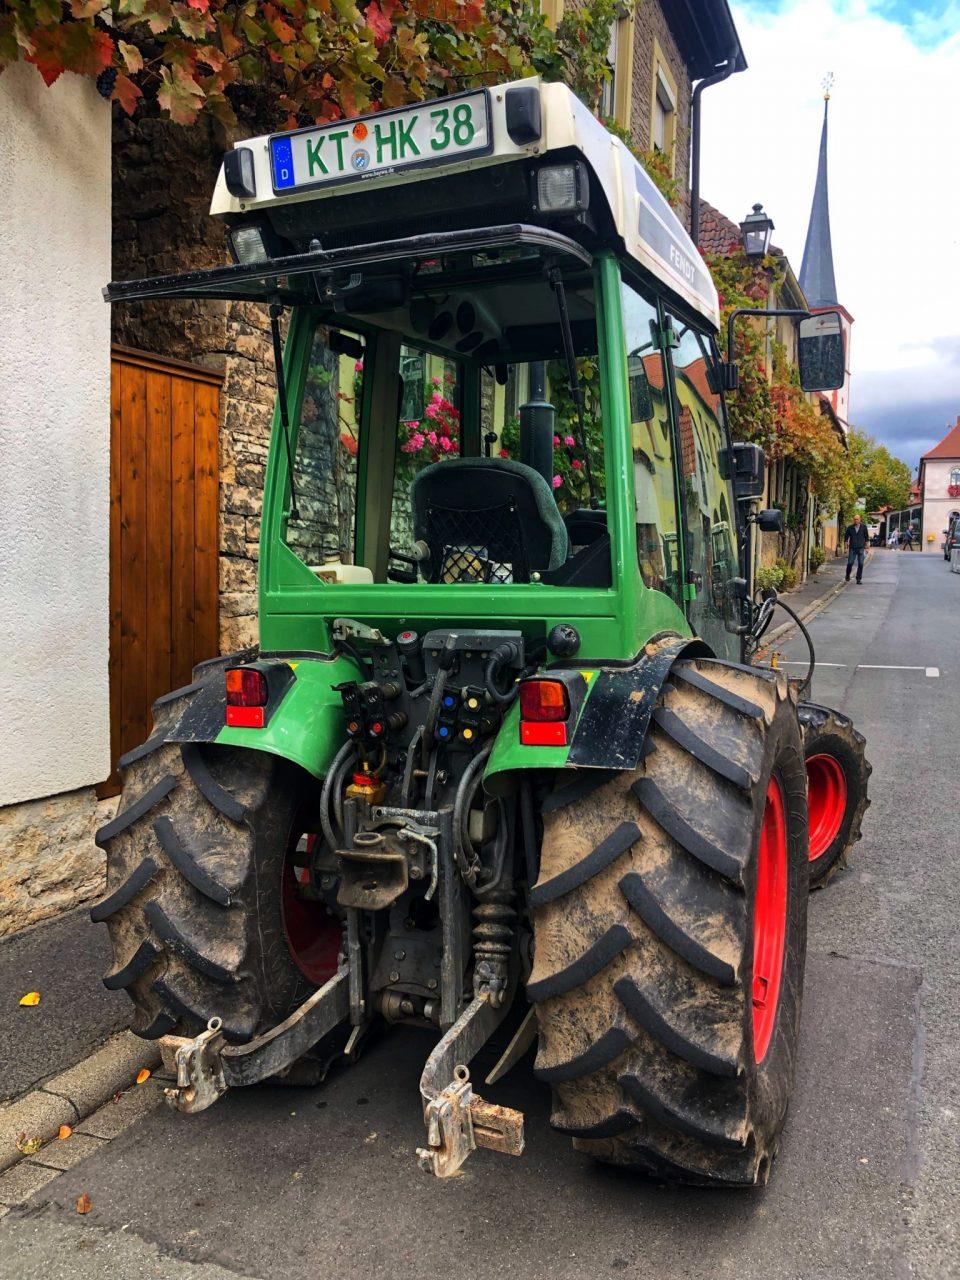 Volkach vineyard tractor, Franconia